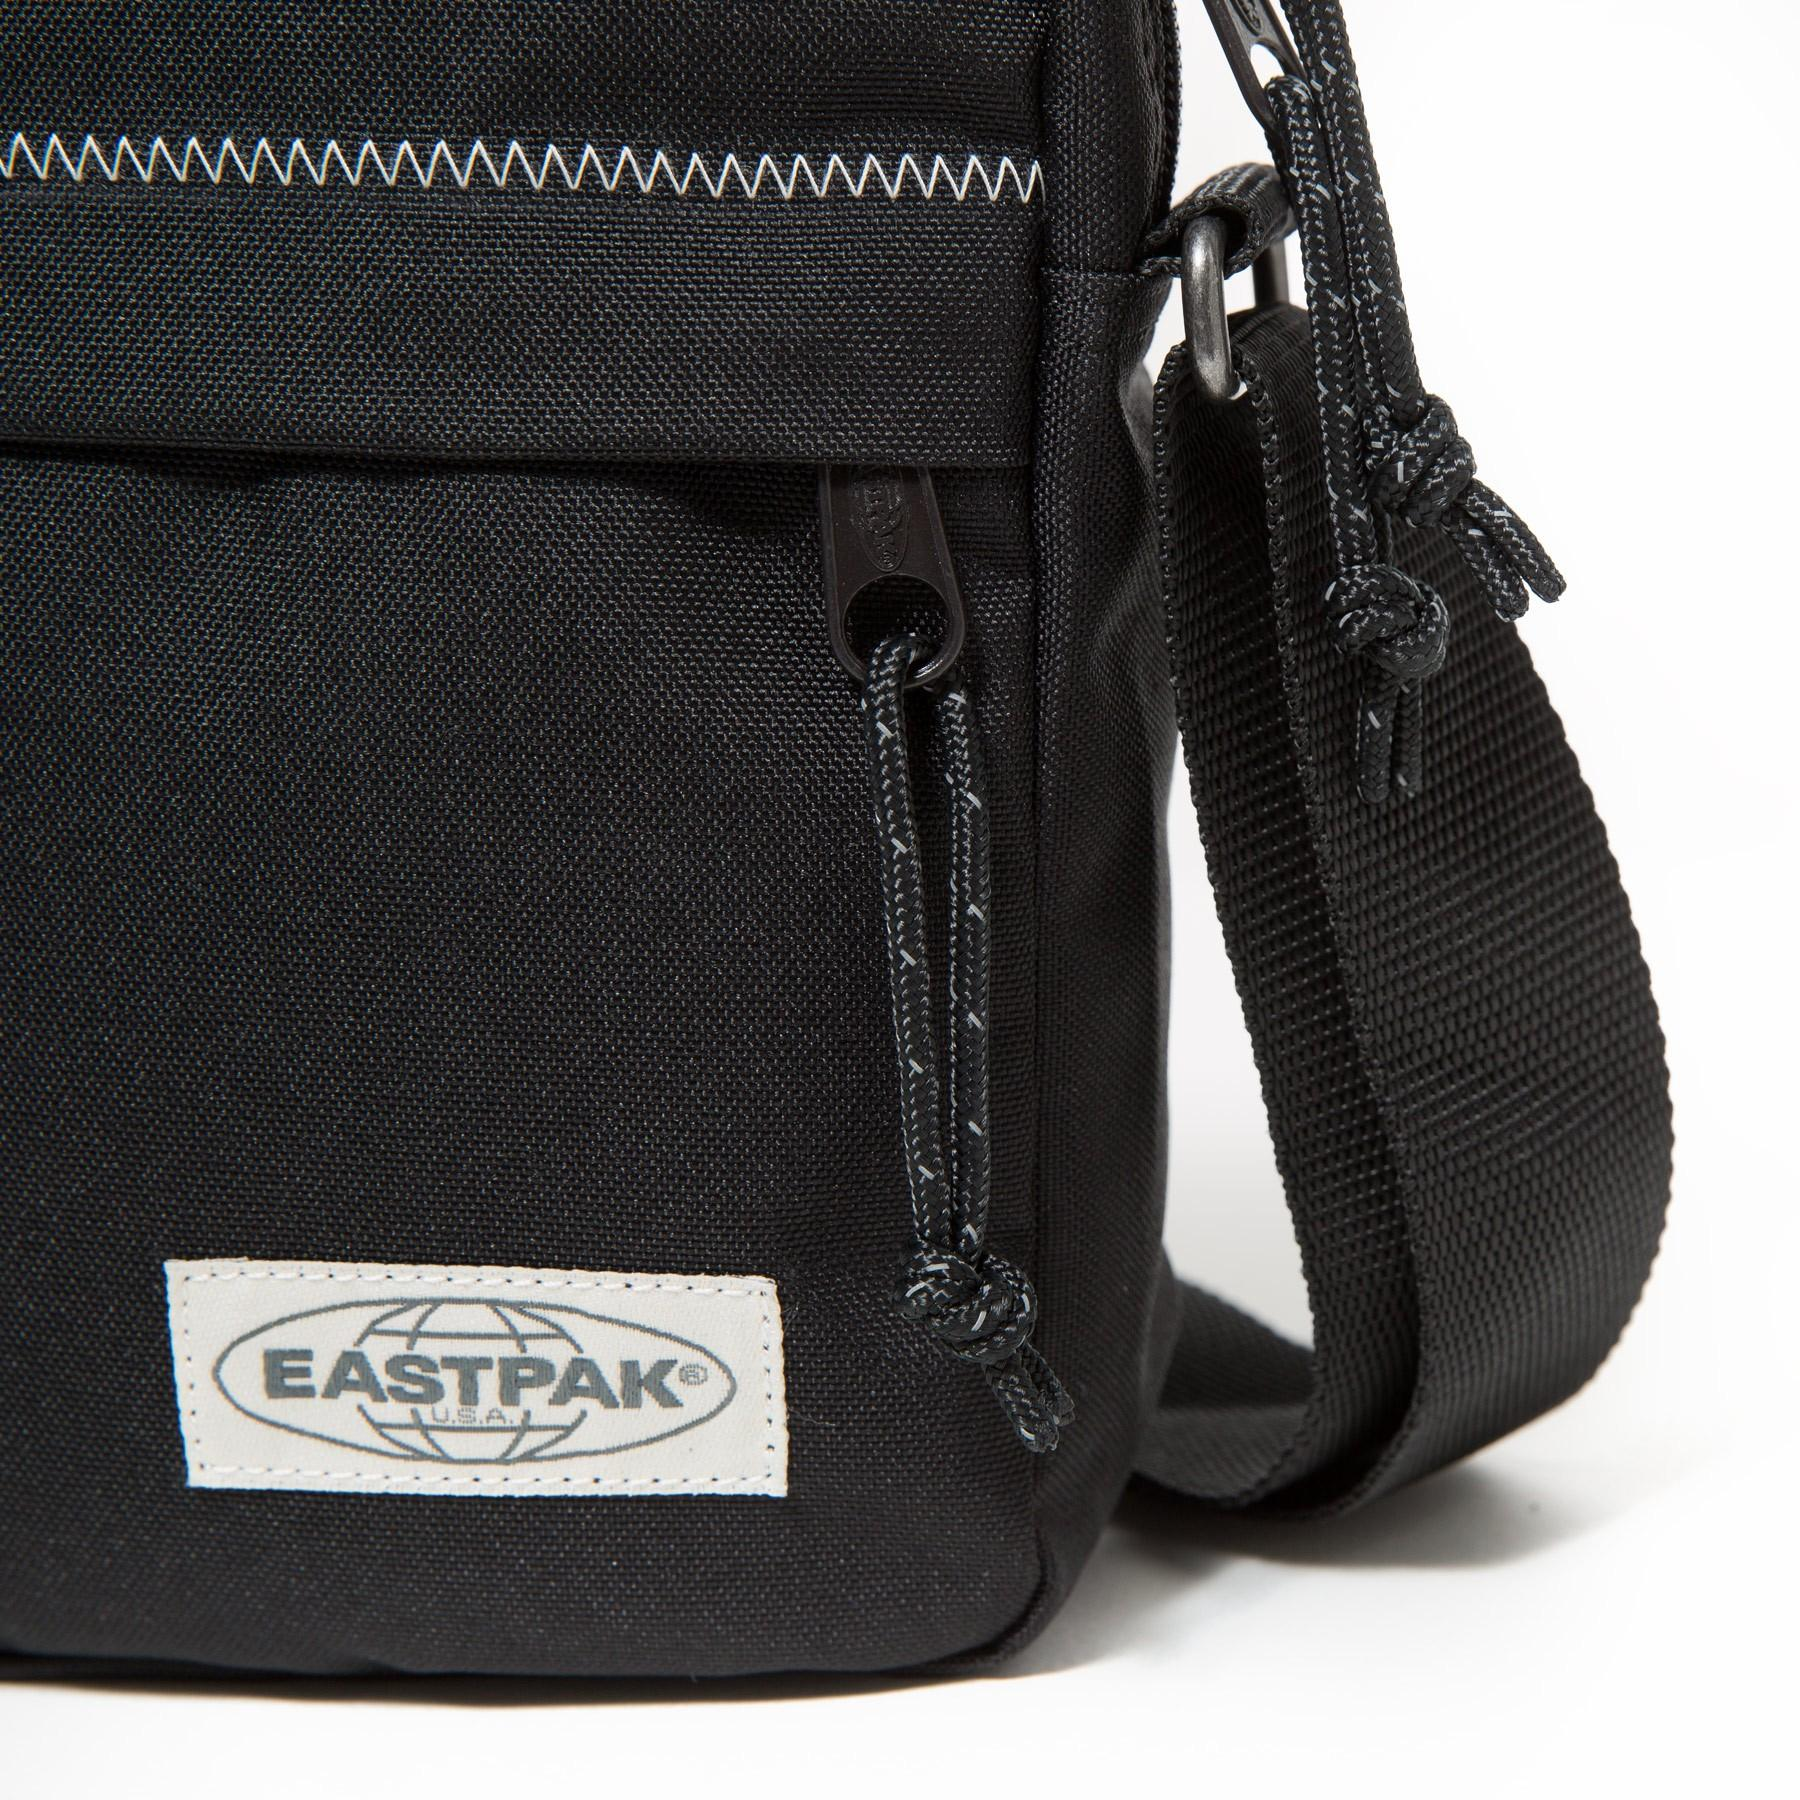 Eastpak The One Bolso Bandolera, 2.5 litros, Azul (Midnight)